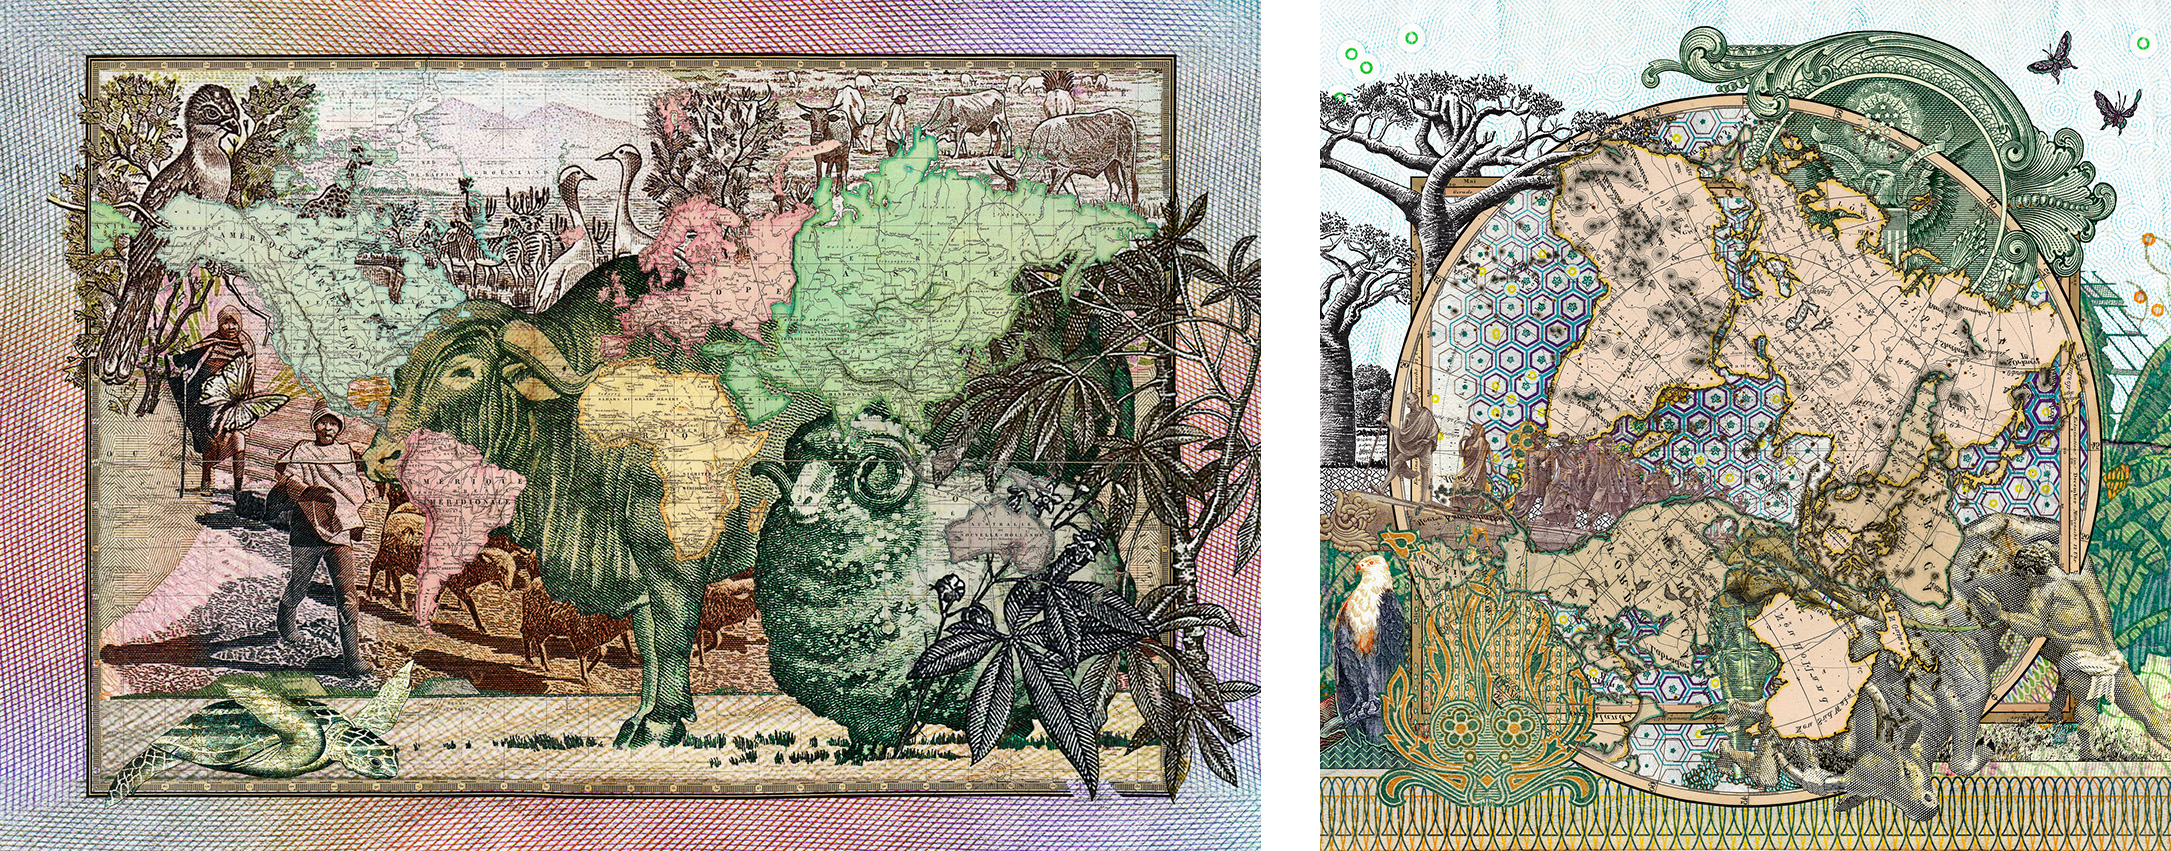 Figures 1862, Le Monde Principales Découvertes   (image left)     Figures 1816, Der Südliche Gestirnte Himmel vs Planiglob der Antipoden   (image right)